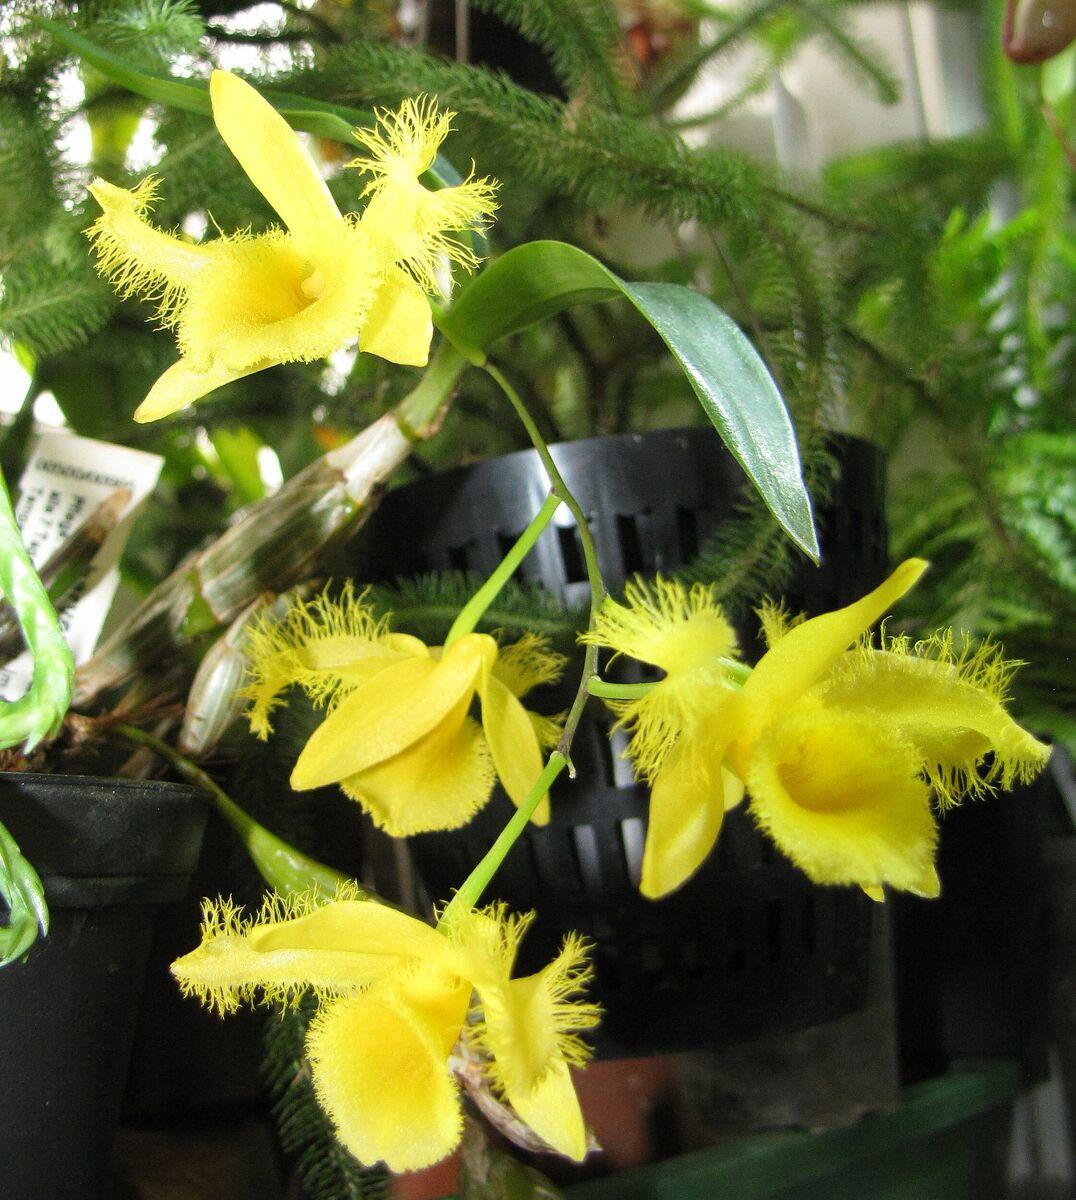 520436108_Dendrobiumharveyanum.thumb.jpg.0bba47aec18ca78bb9cafbb47feca272.jpg